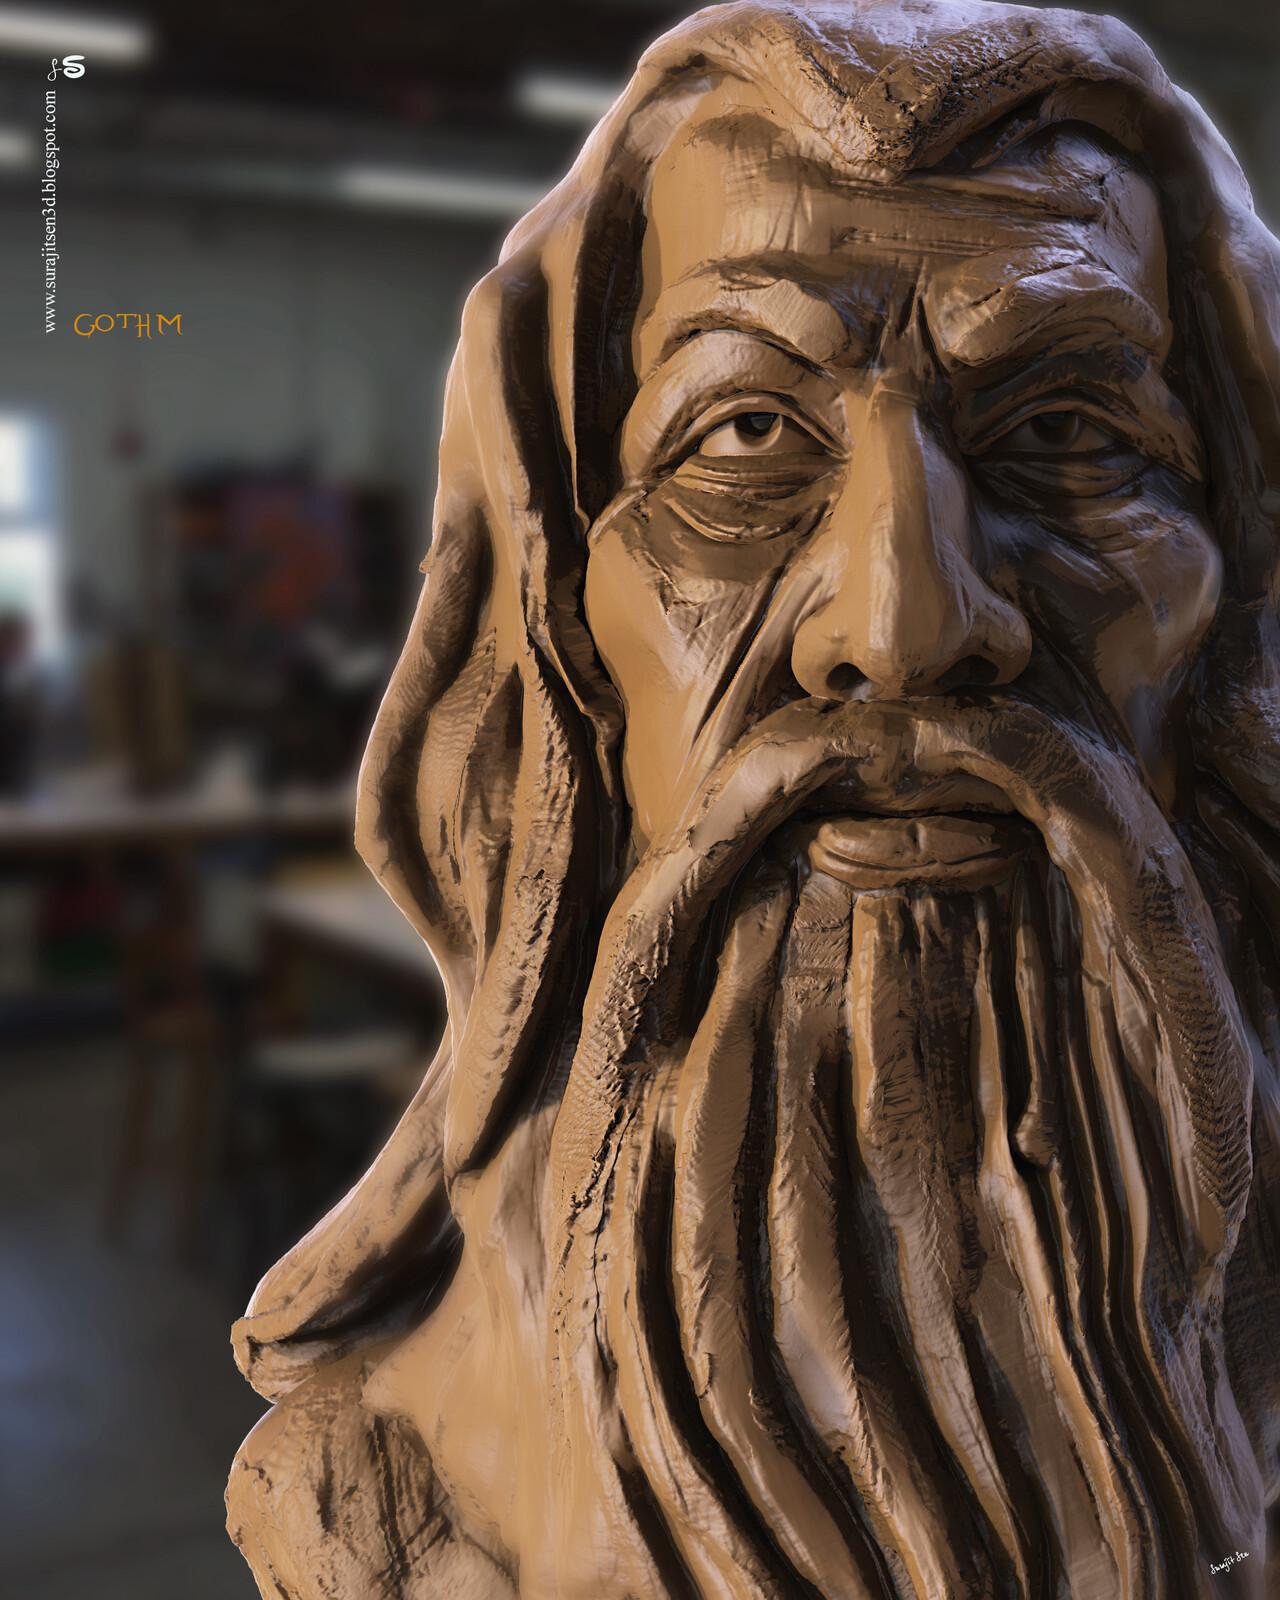 Gothm2.1 Digital Sculpture One of my free time speed Digital Sculptures Background music- #hanszimmermusic